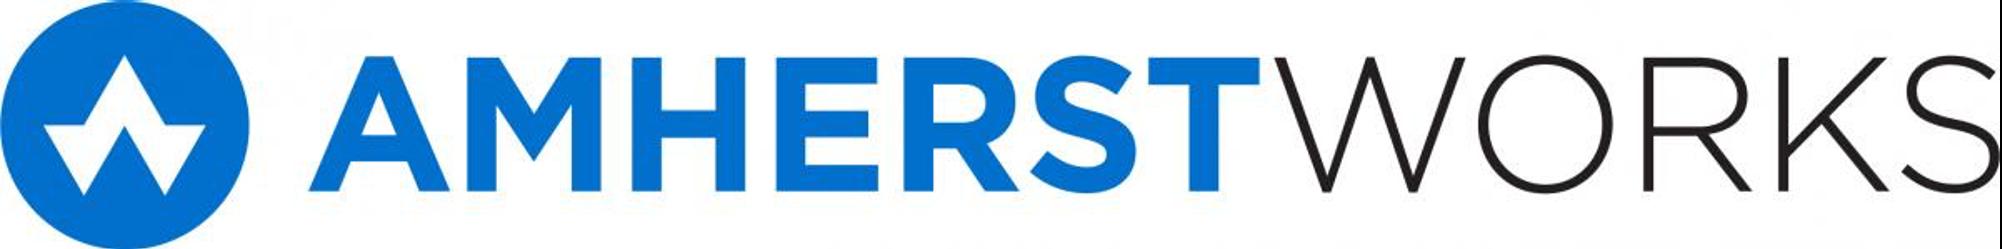 https://growthzonesitesprod.azureedge.net/wp-content/uploads/sites/1693/2020/11/AmherstWorks-Logo.png